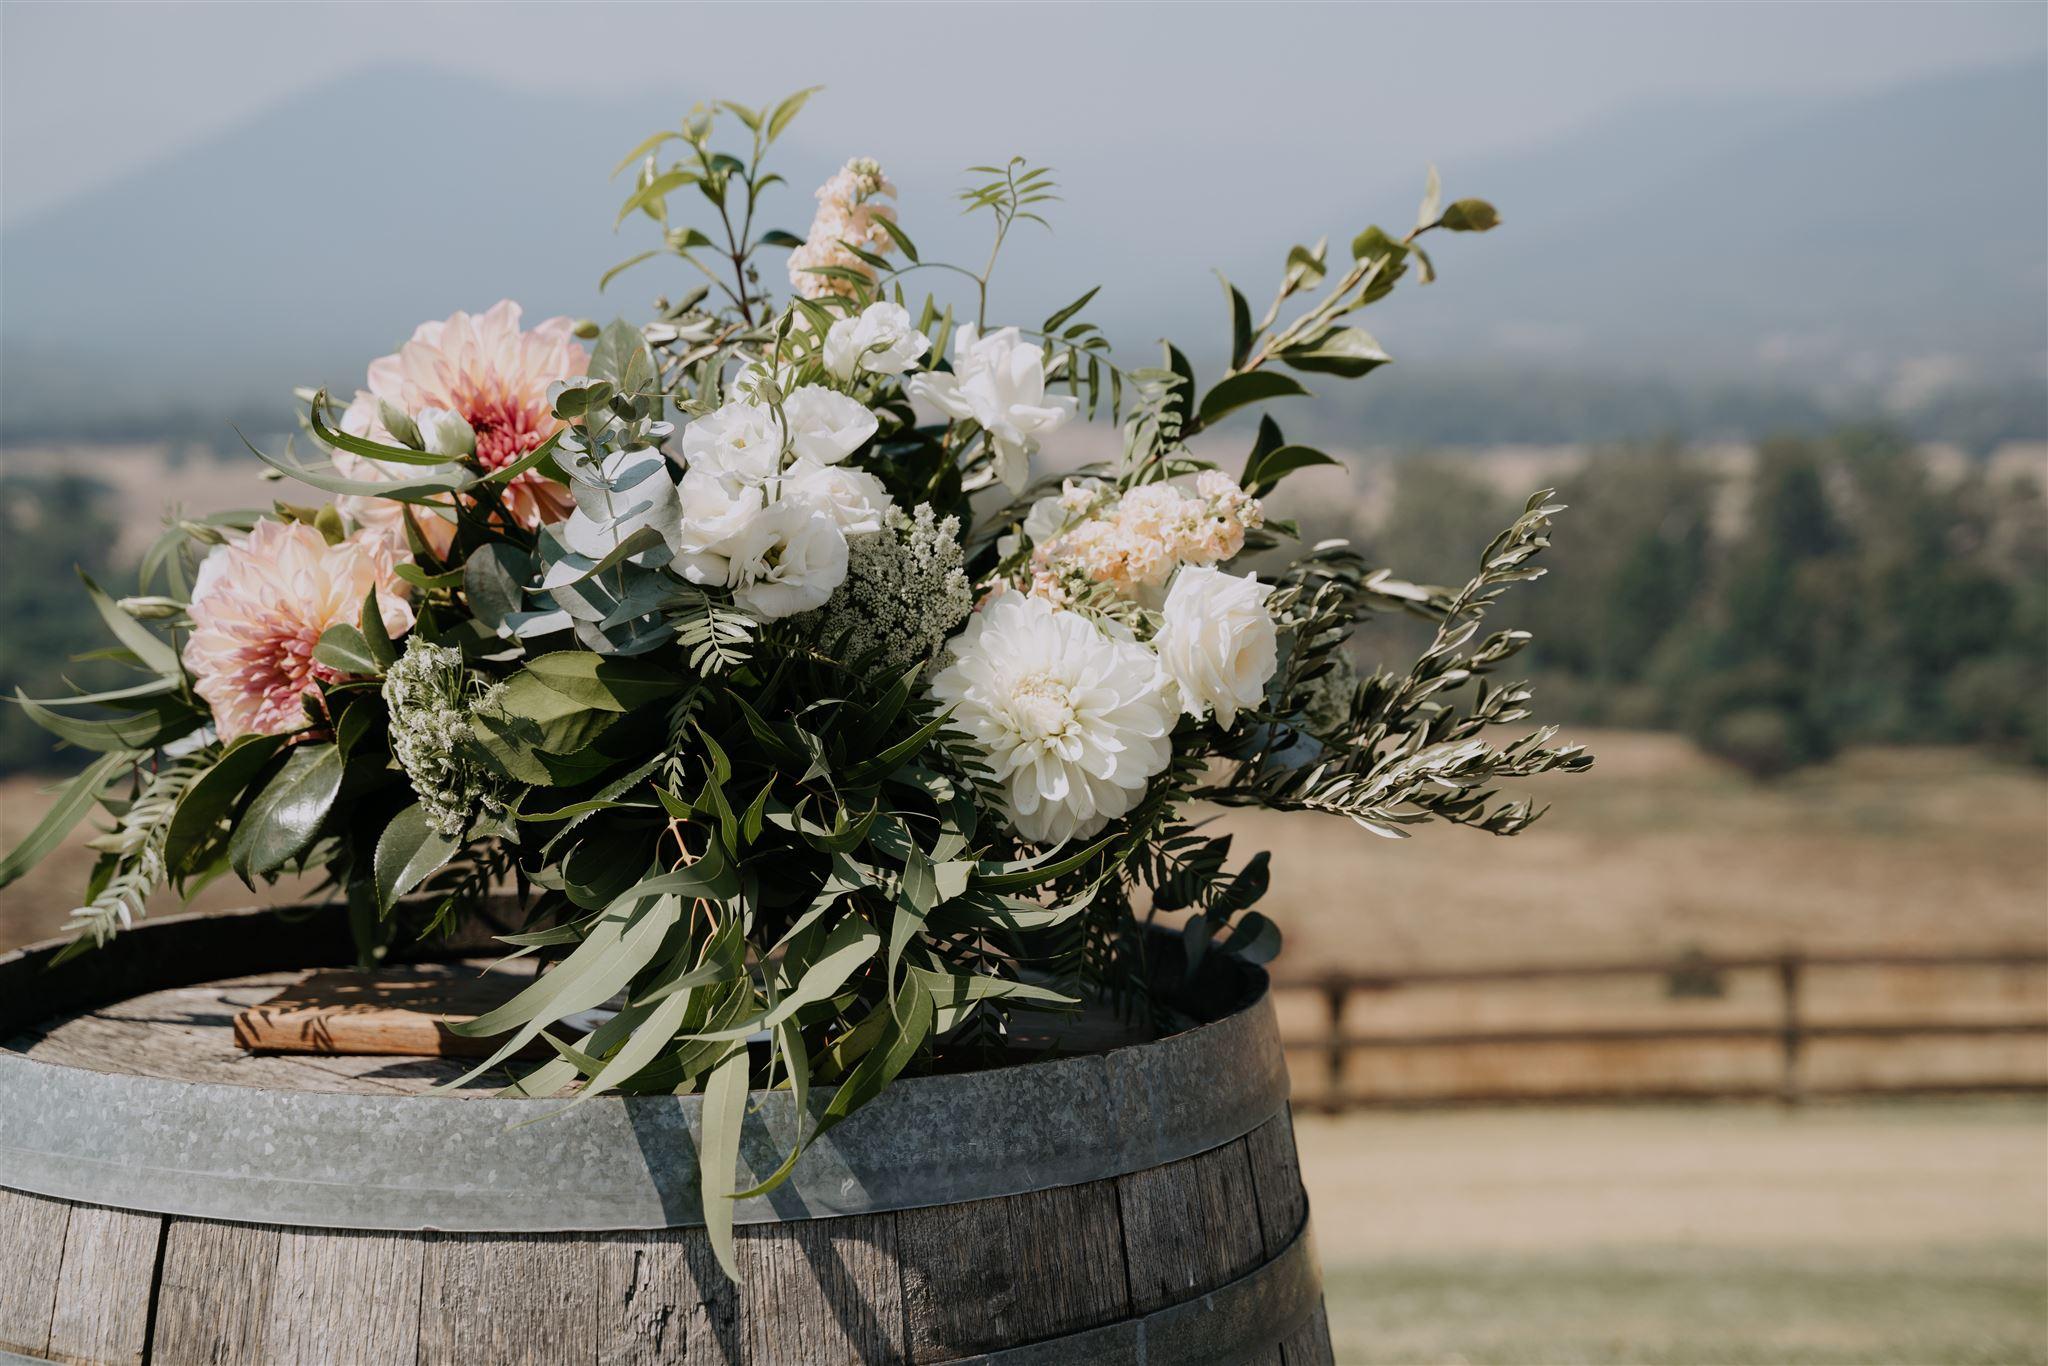 Penny-and-Neil-Riverstone-Estate-Wedding-0011_websize.jpg